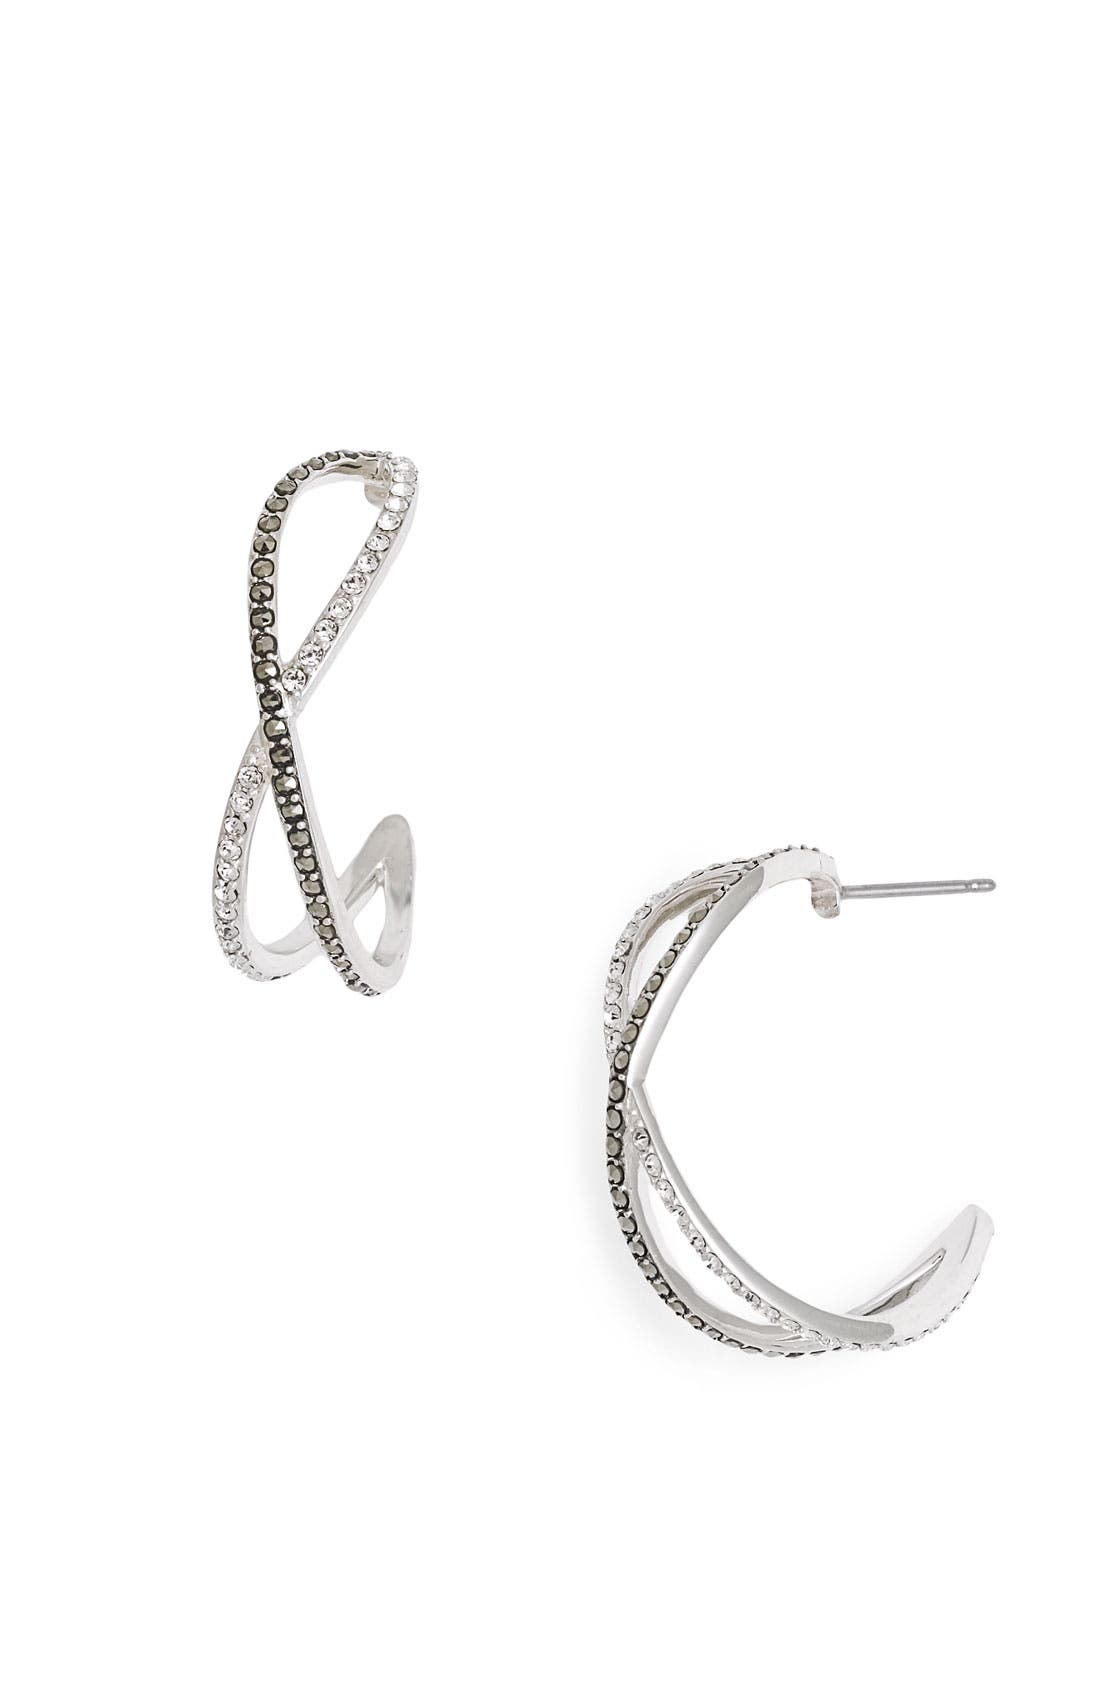 Alternate Image 1 Selected - Judith Jack 'Licorice' Small Hoop Earrings